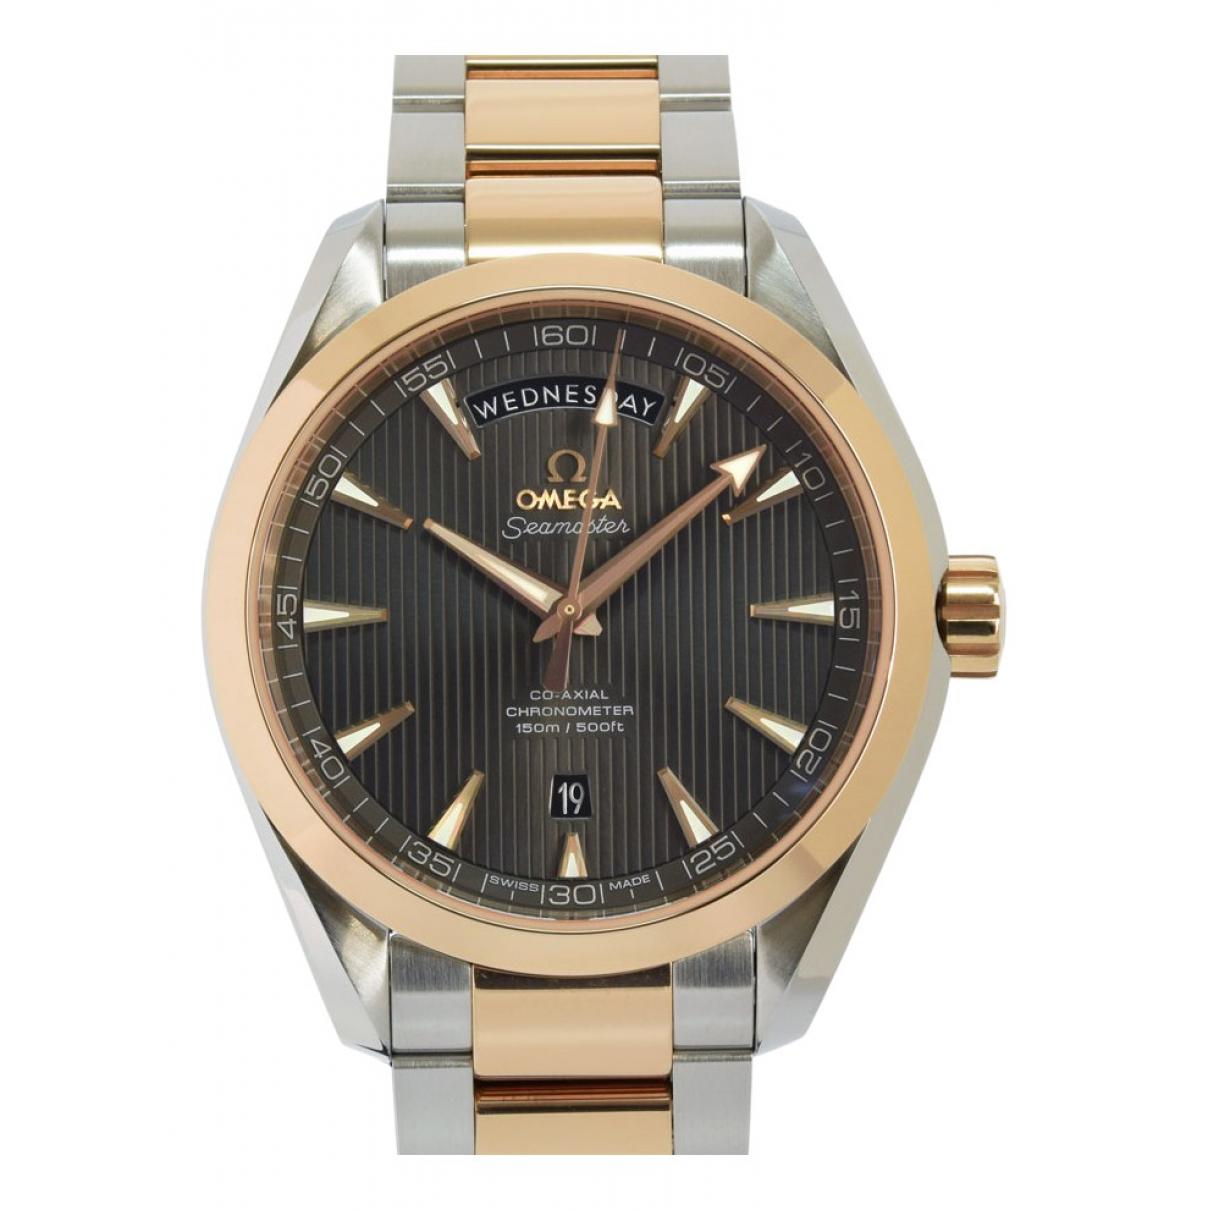 Omega Seamaster Aquaterra Uhr in  Grau Gold und Stahl